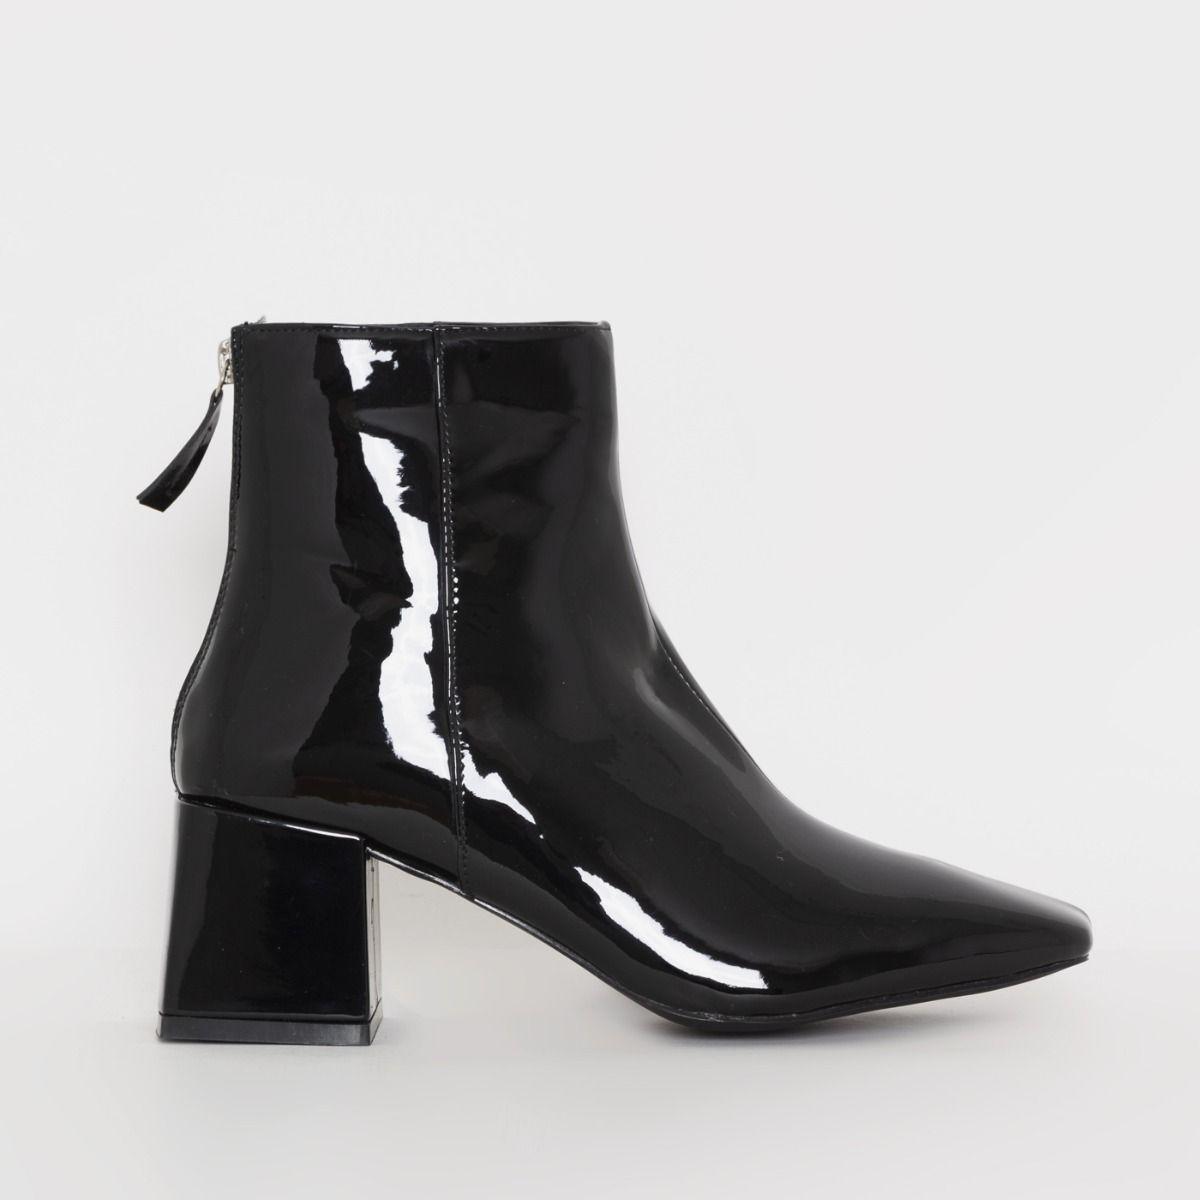 Fabel Black Patent Block Heel Ankle Boots